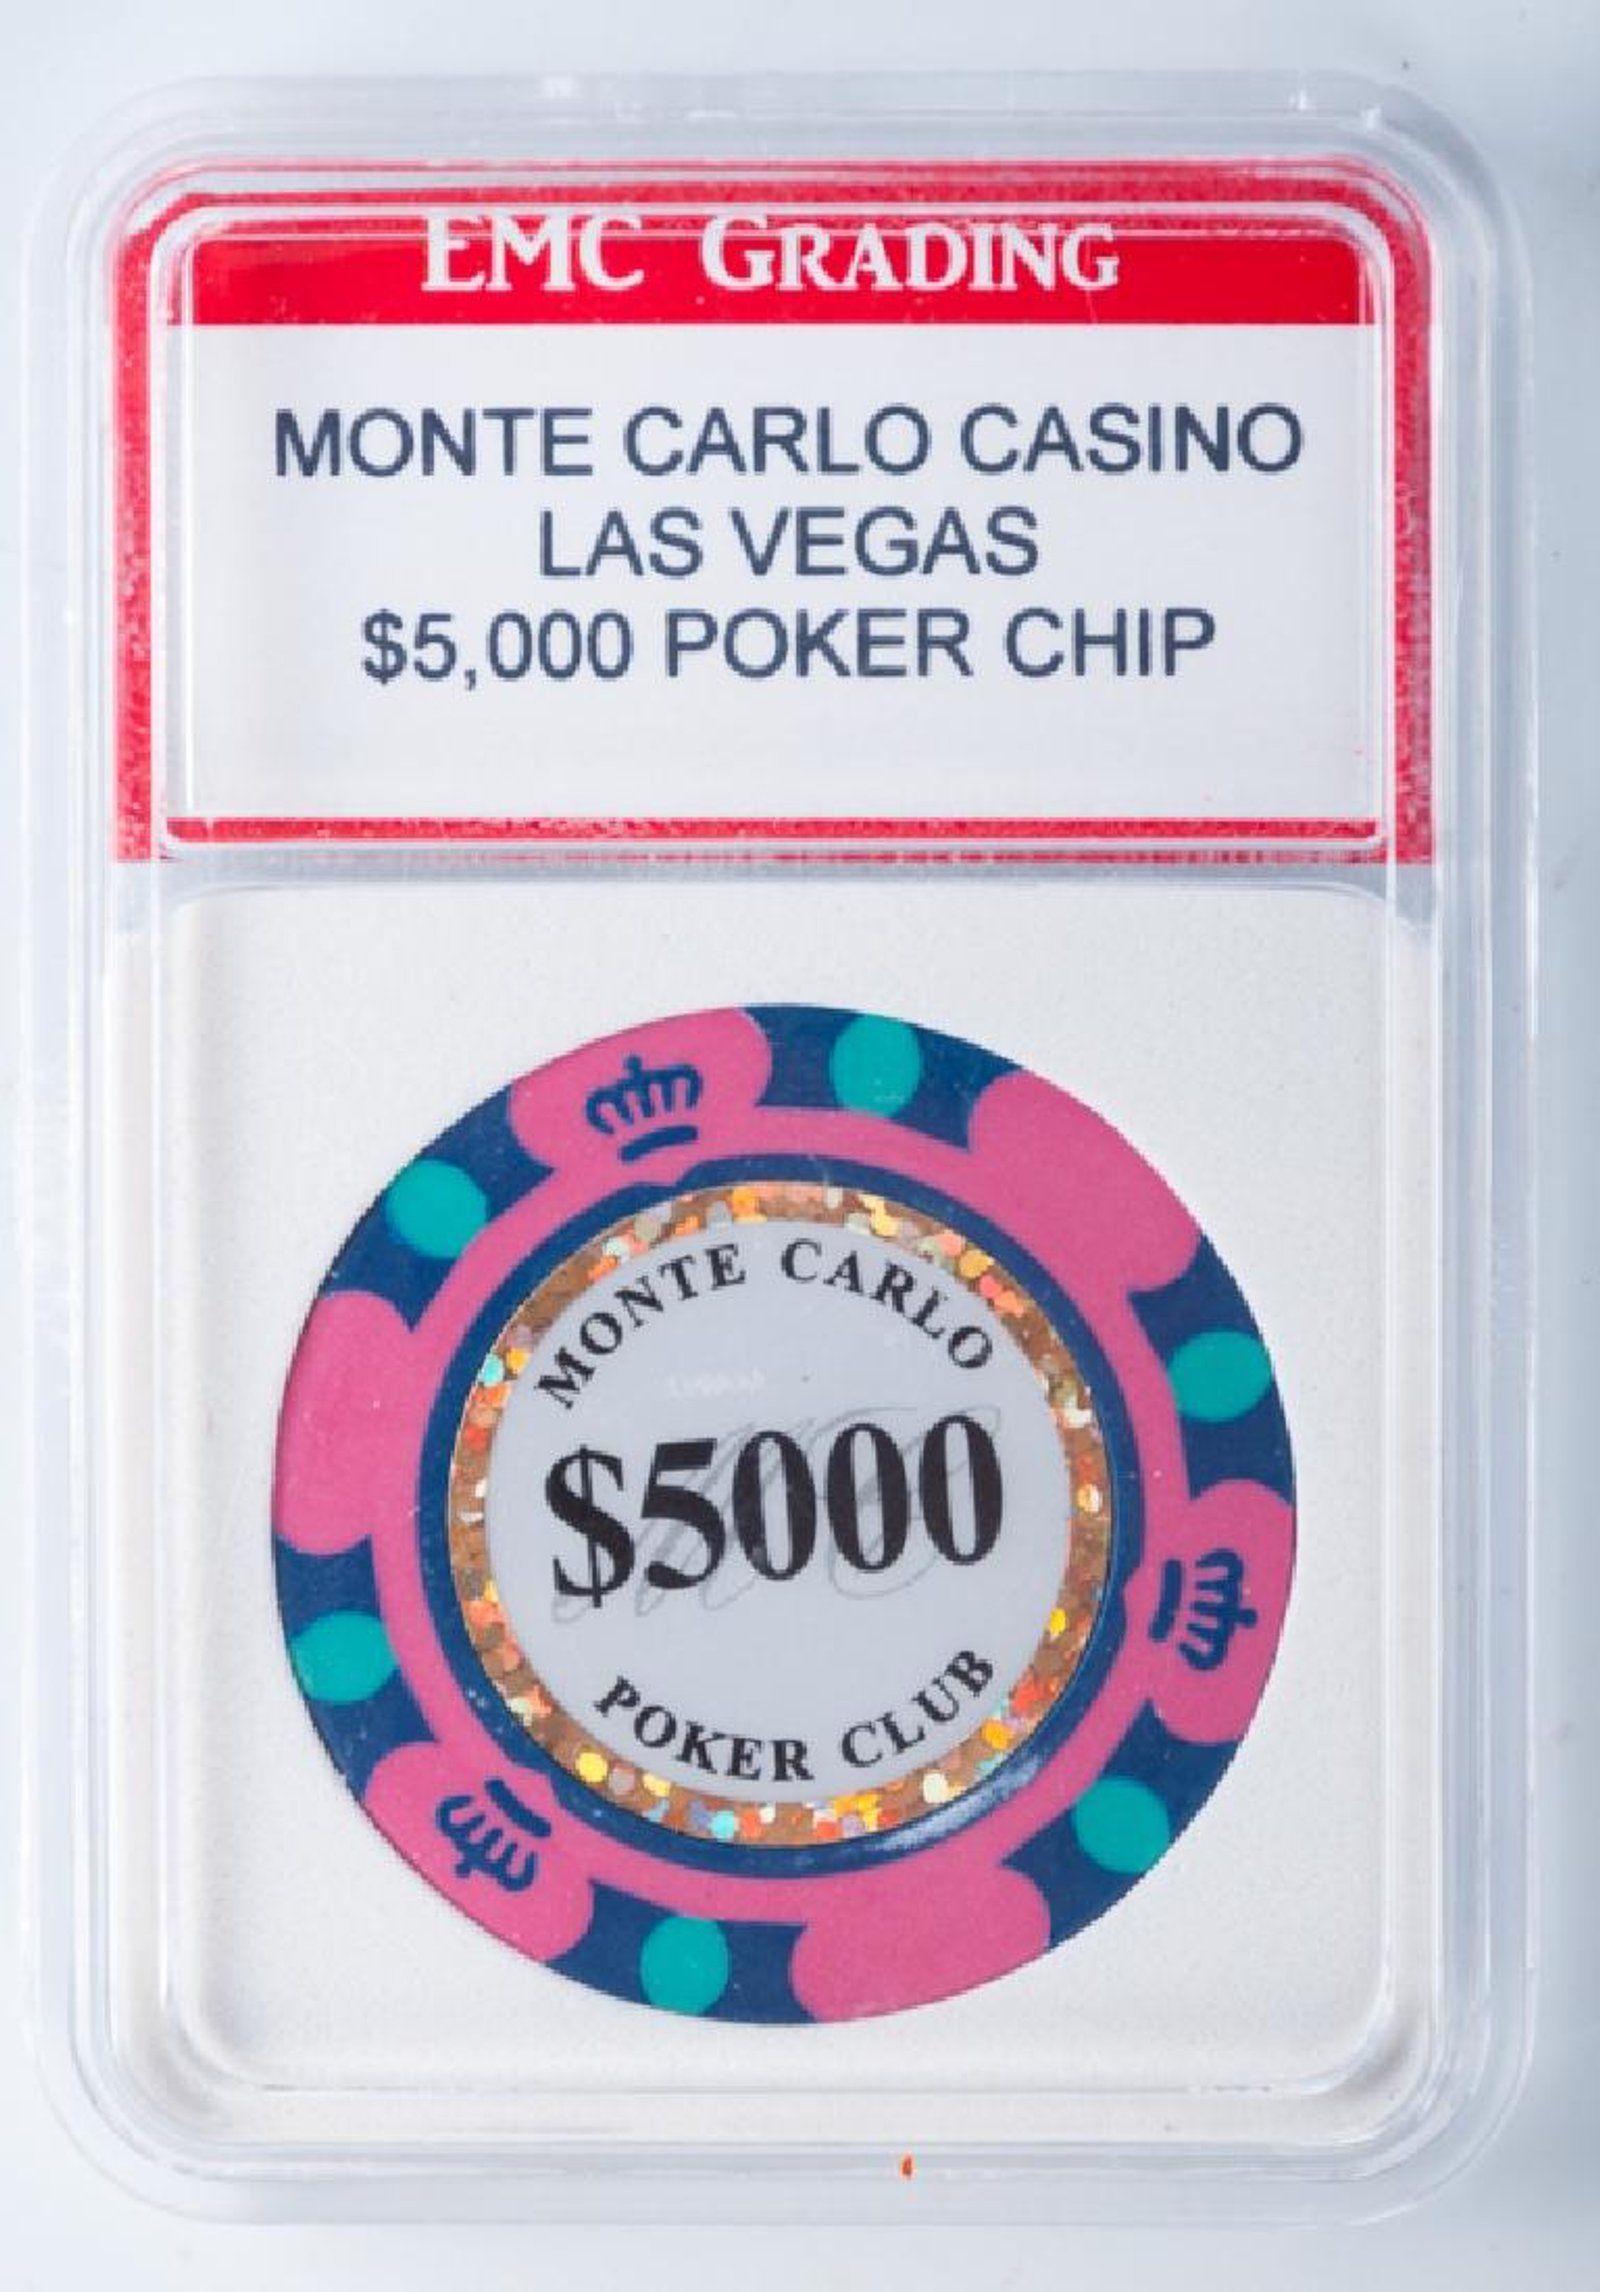 Monte Carlo Casino 5,000 Poker Chip Card factory, Poker